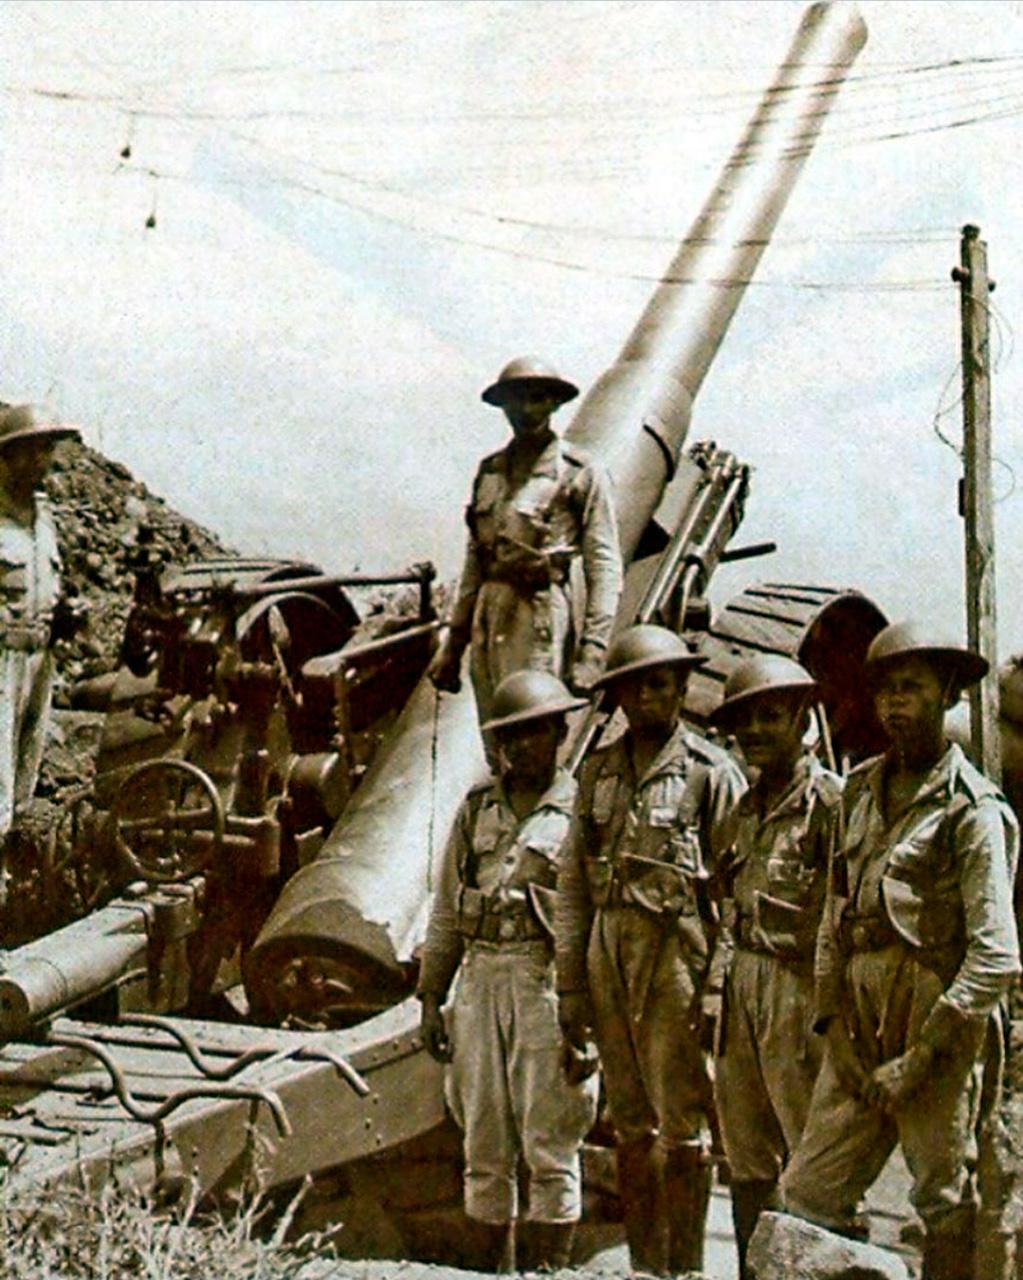 Bateria Antiaérea americana durante segunda guerra mundial